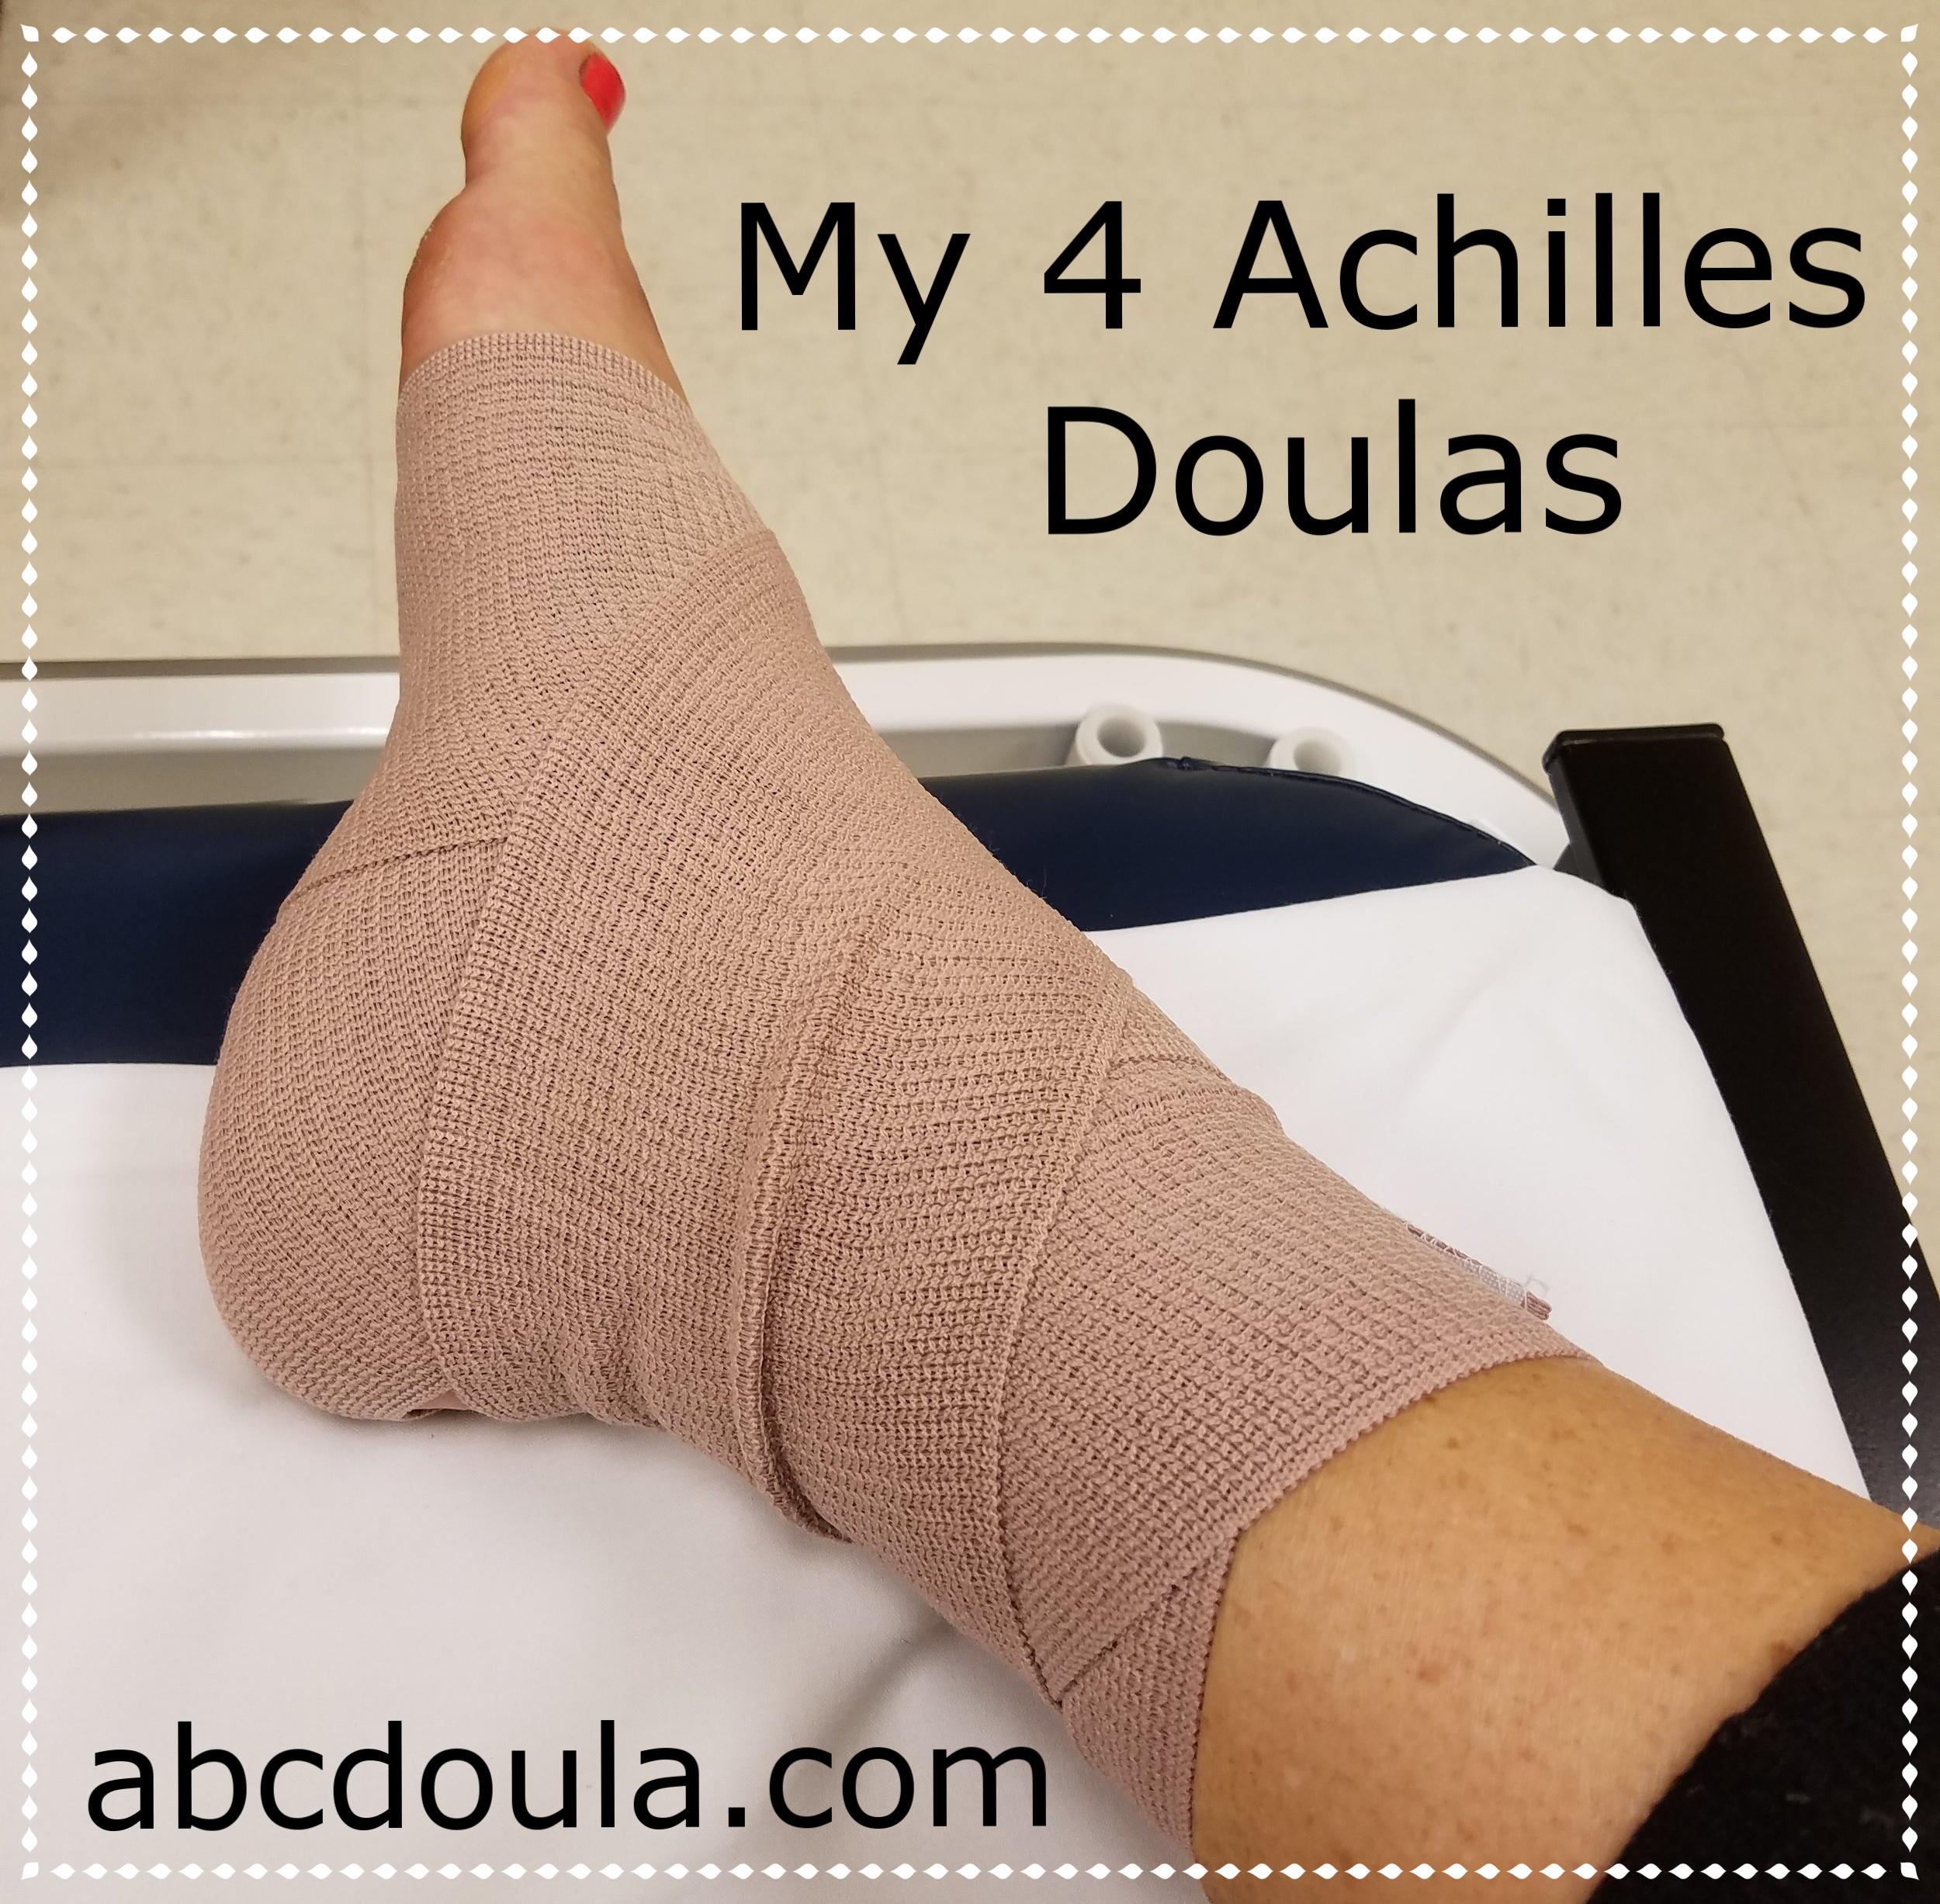 27526feefc Blog Back End — ABC Doula Service